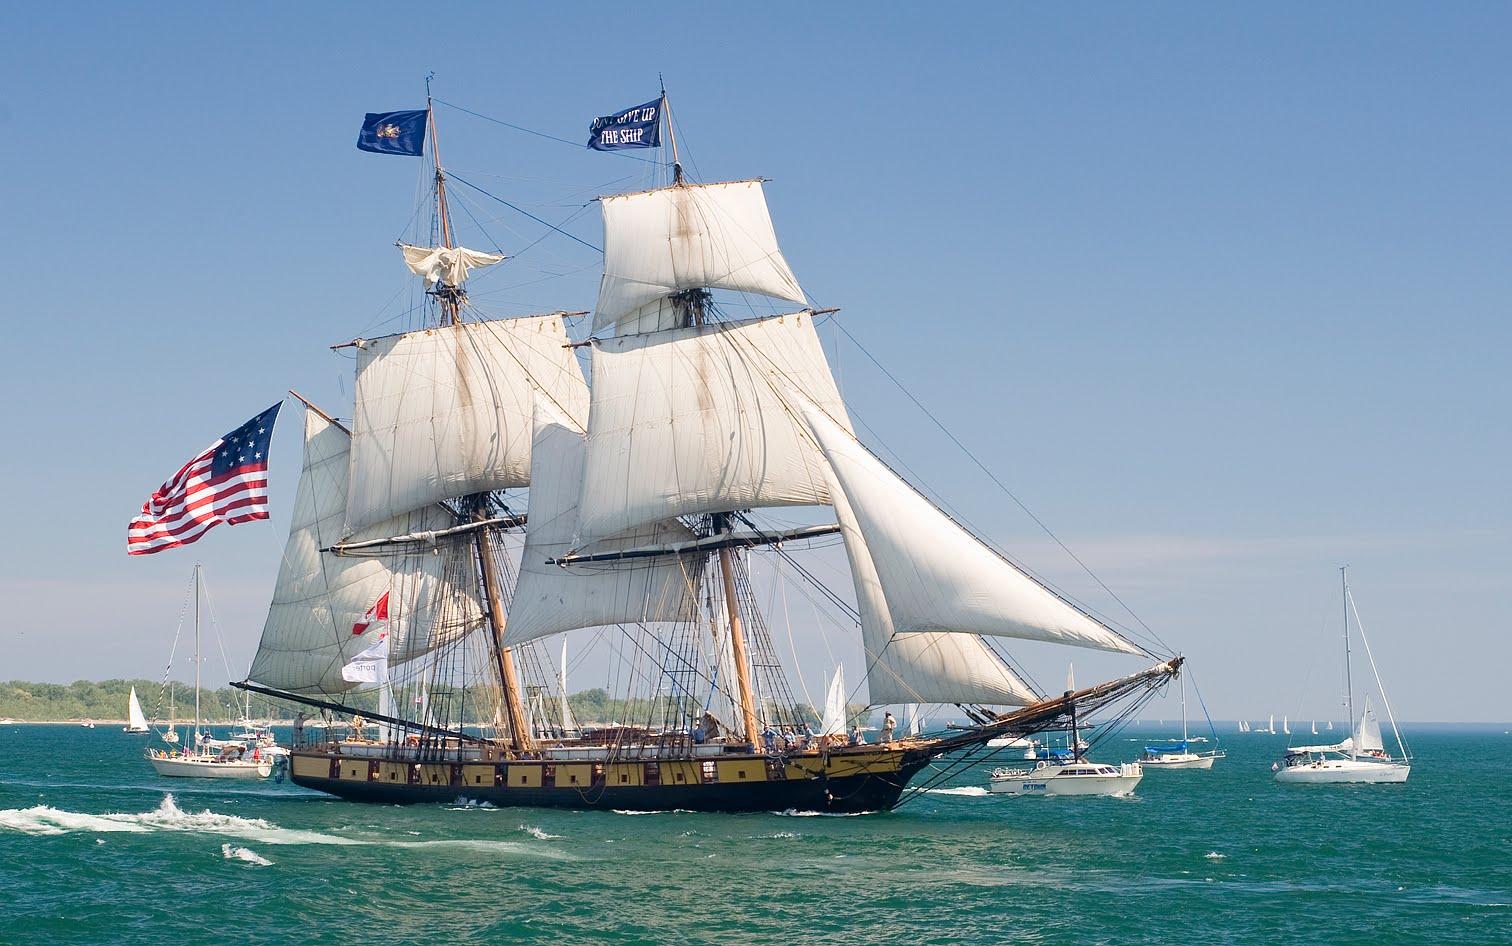 david leadbitter photography: Tall Ships In Toronto